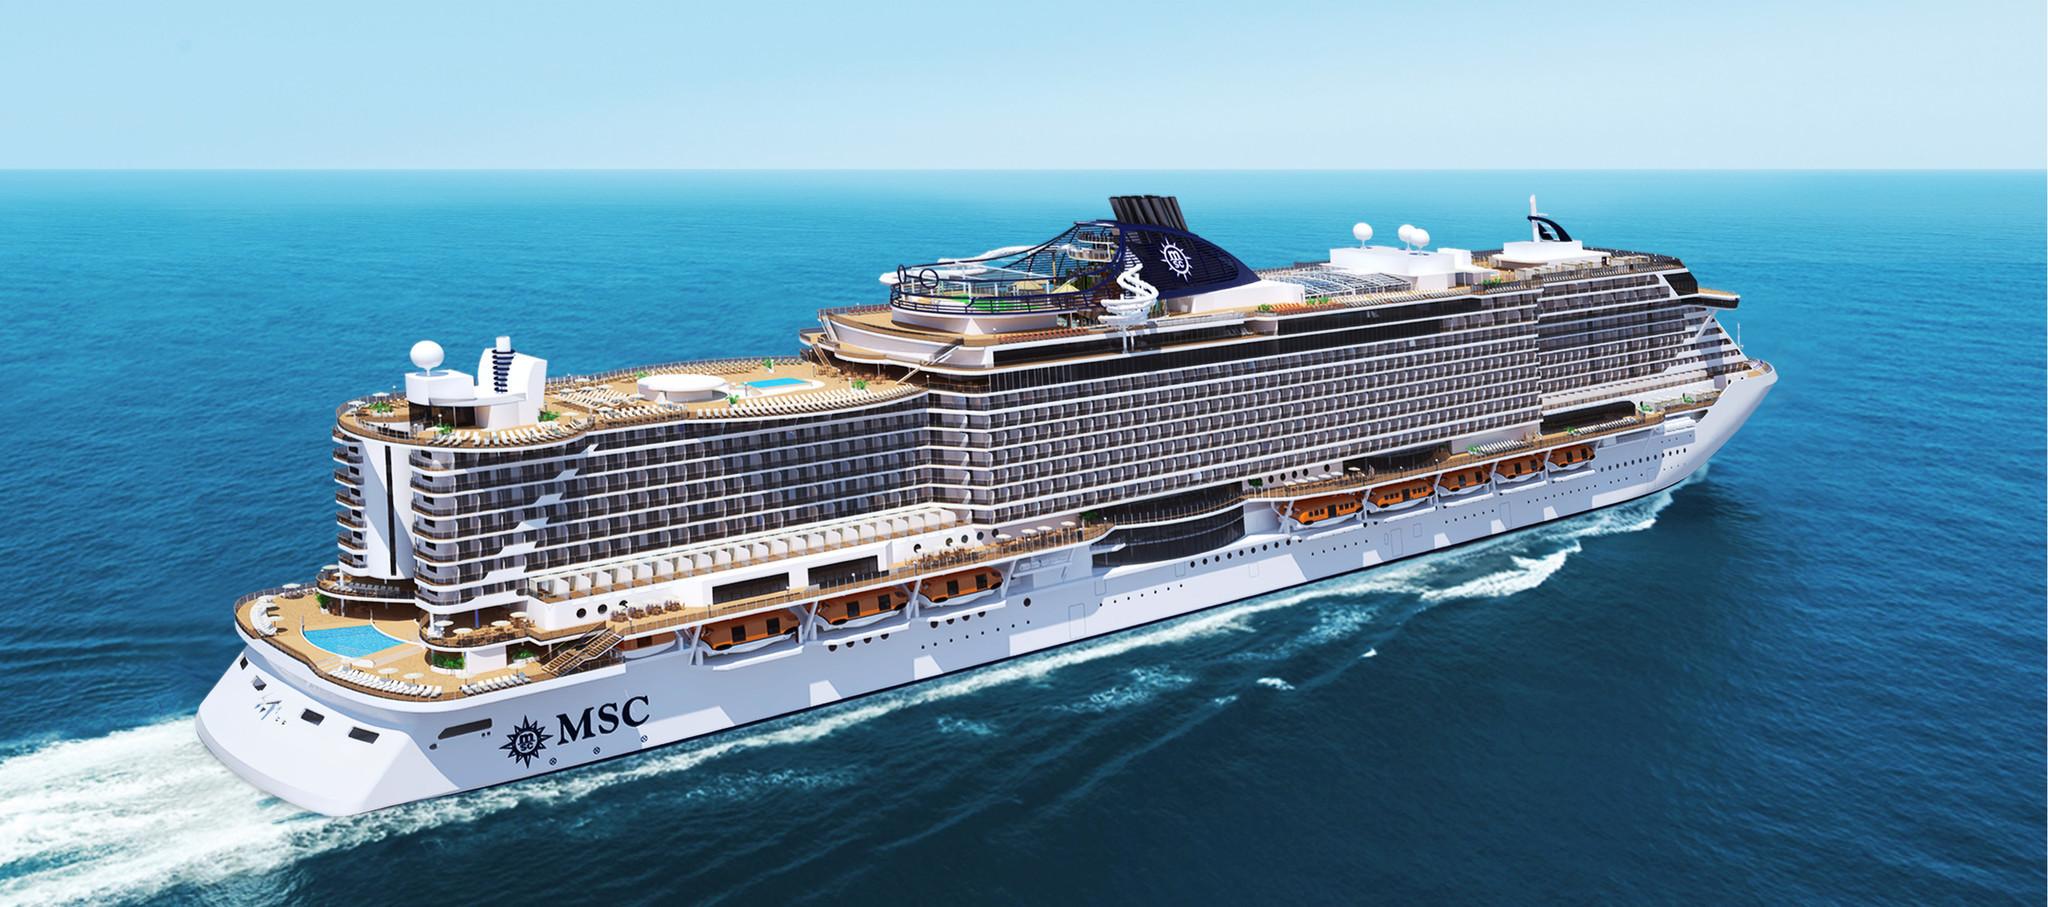 Construction begins on msc seaside cruise ship sun sentinel for Costa diadema wikipedia